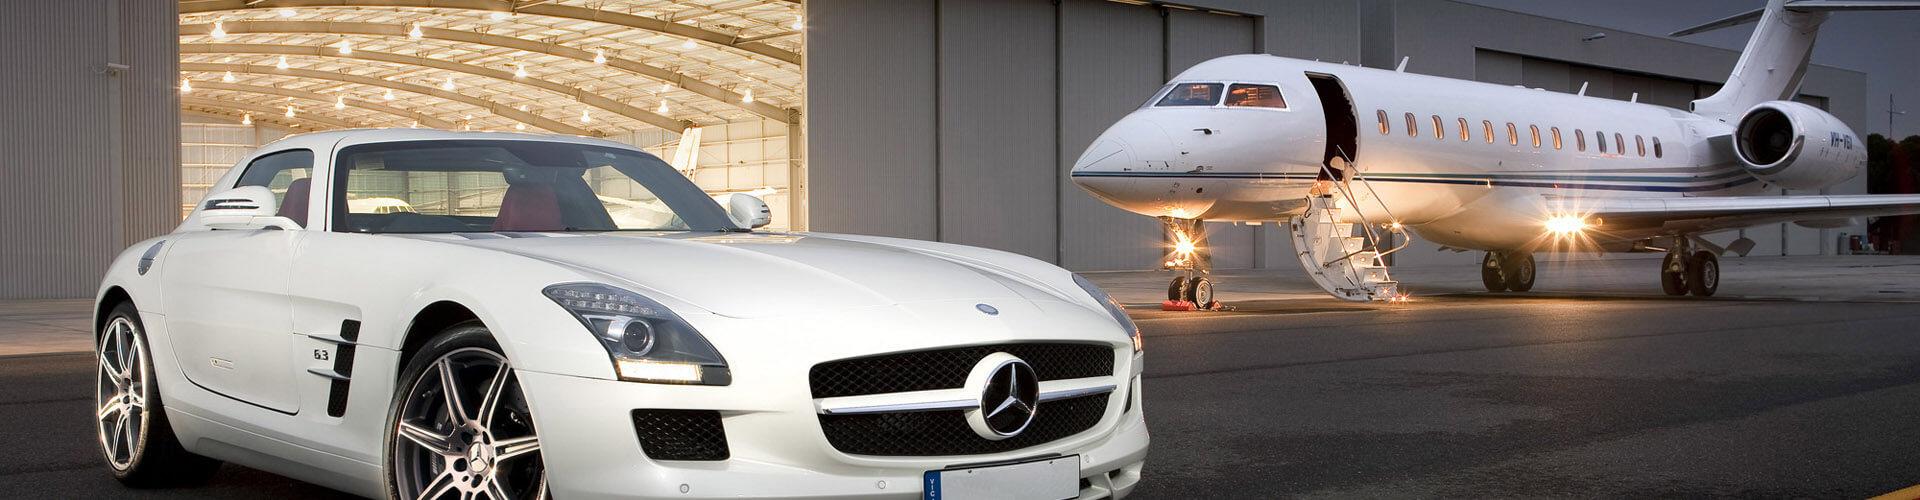 Build A Car >> luxury-jet-car – Double Infinity